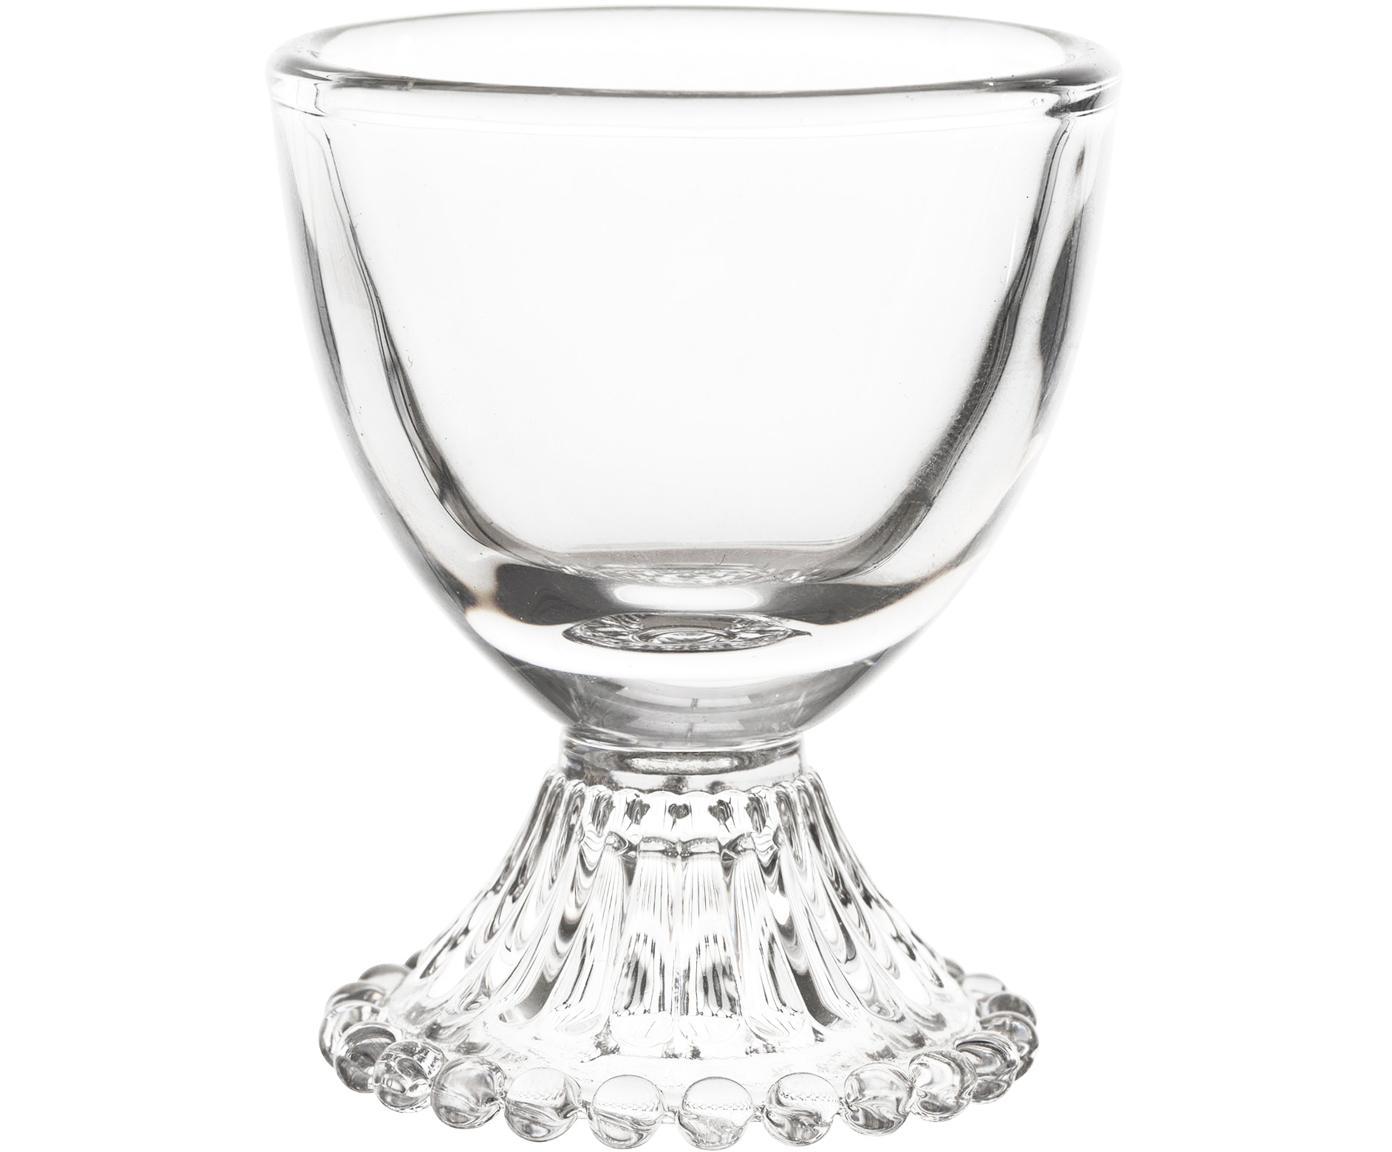 Eierdopjes Perles, 6 stuks, Glas, Transparant, Ø 6 cm